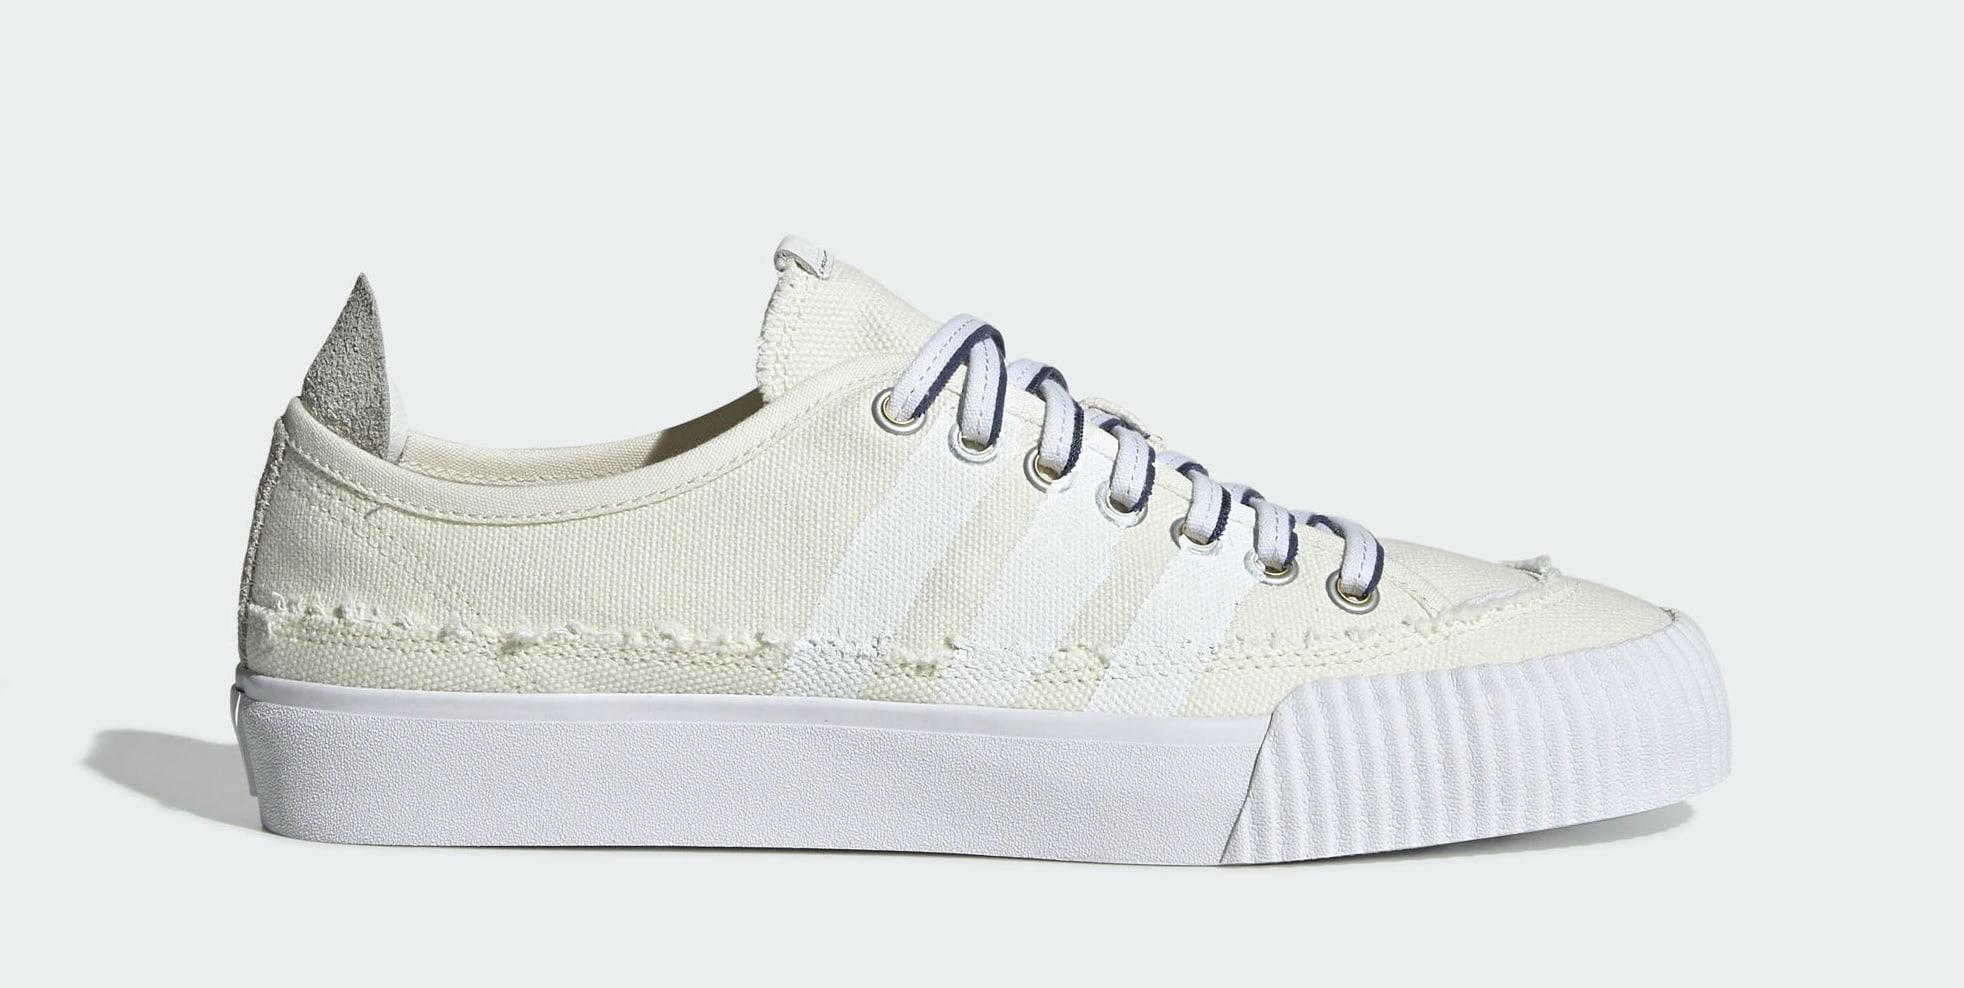 donald-glover-adidas-nizza-eg1761-release-date